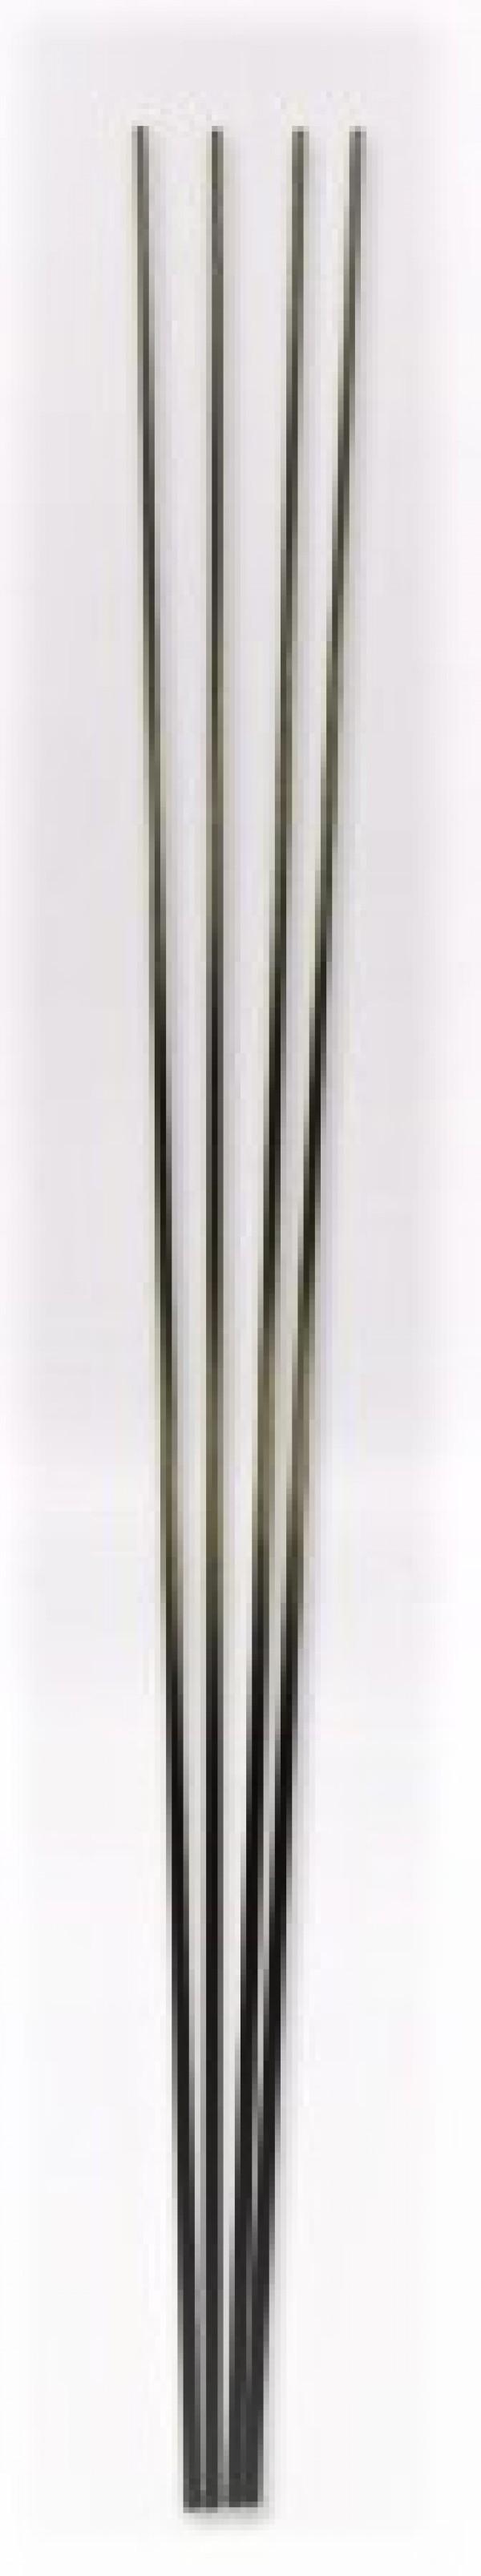 Rezervni deo-Karbon sekcija III deo 10mm x 1.1m